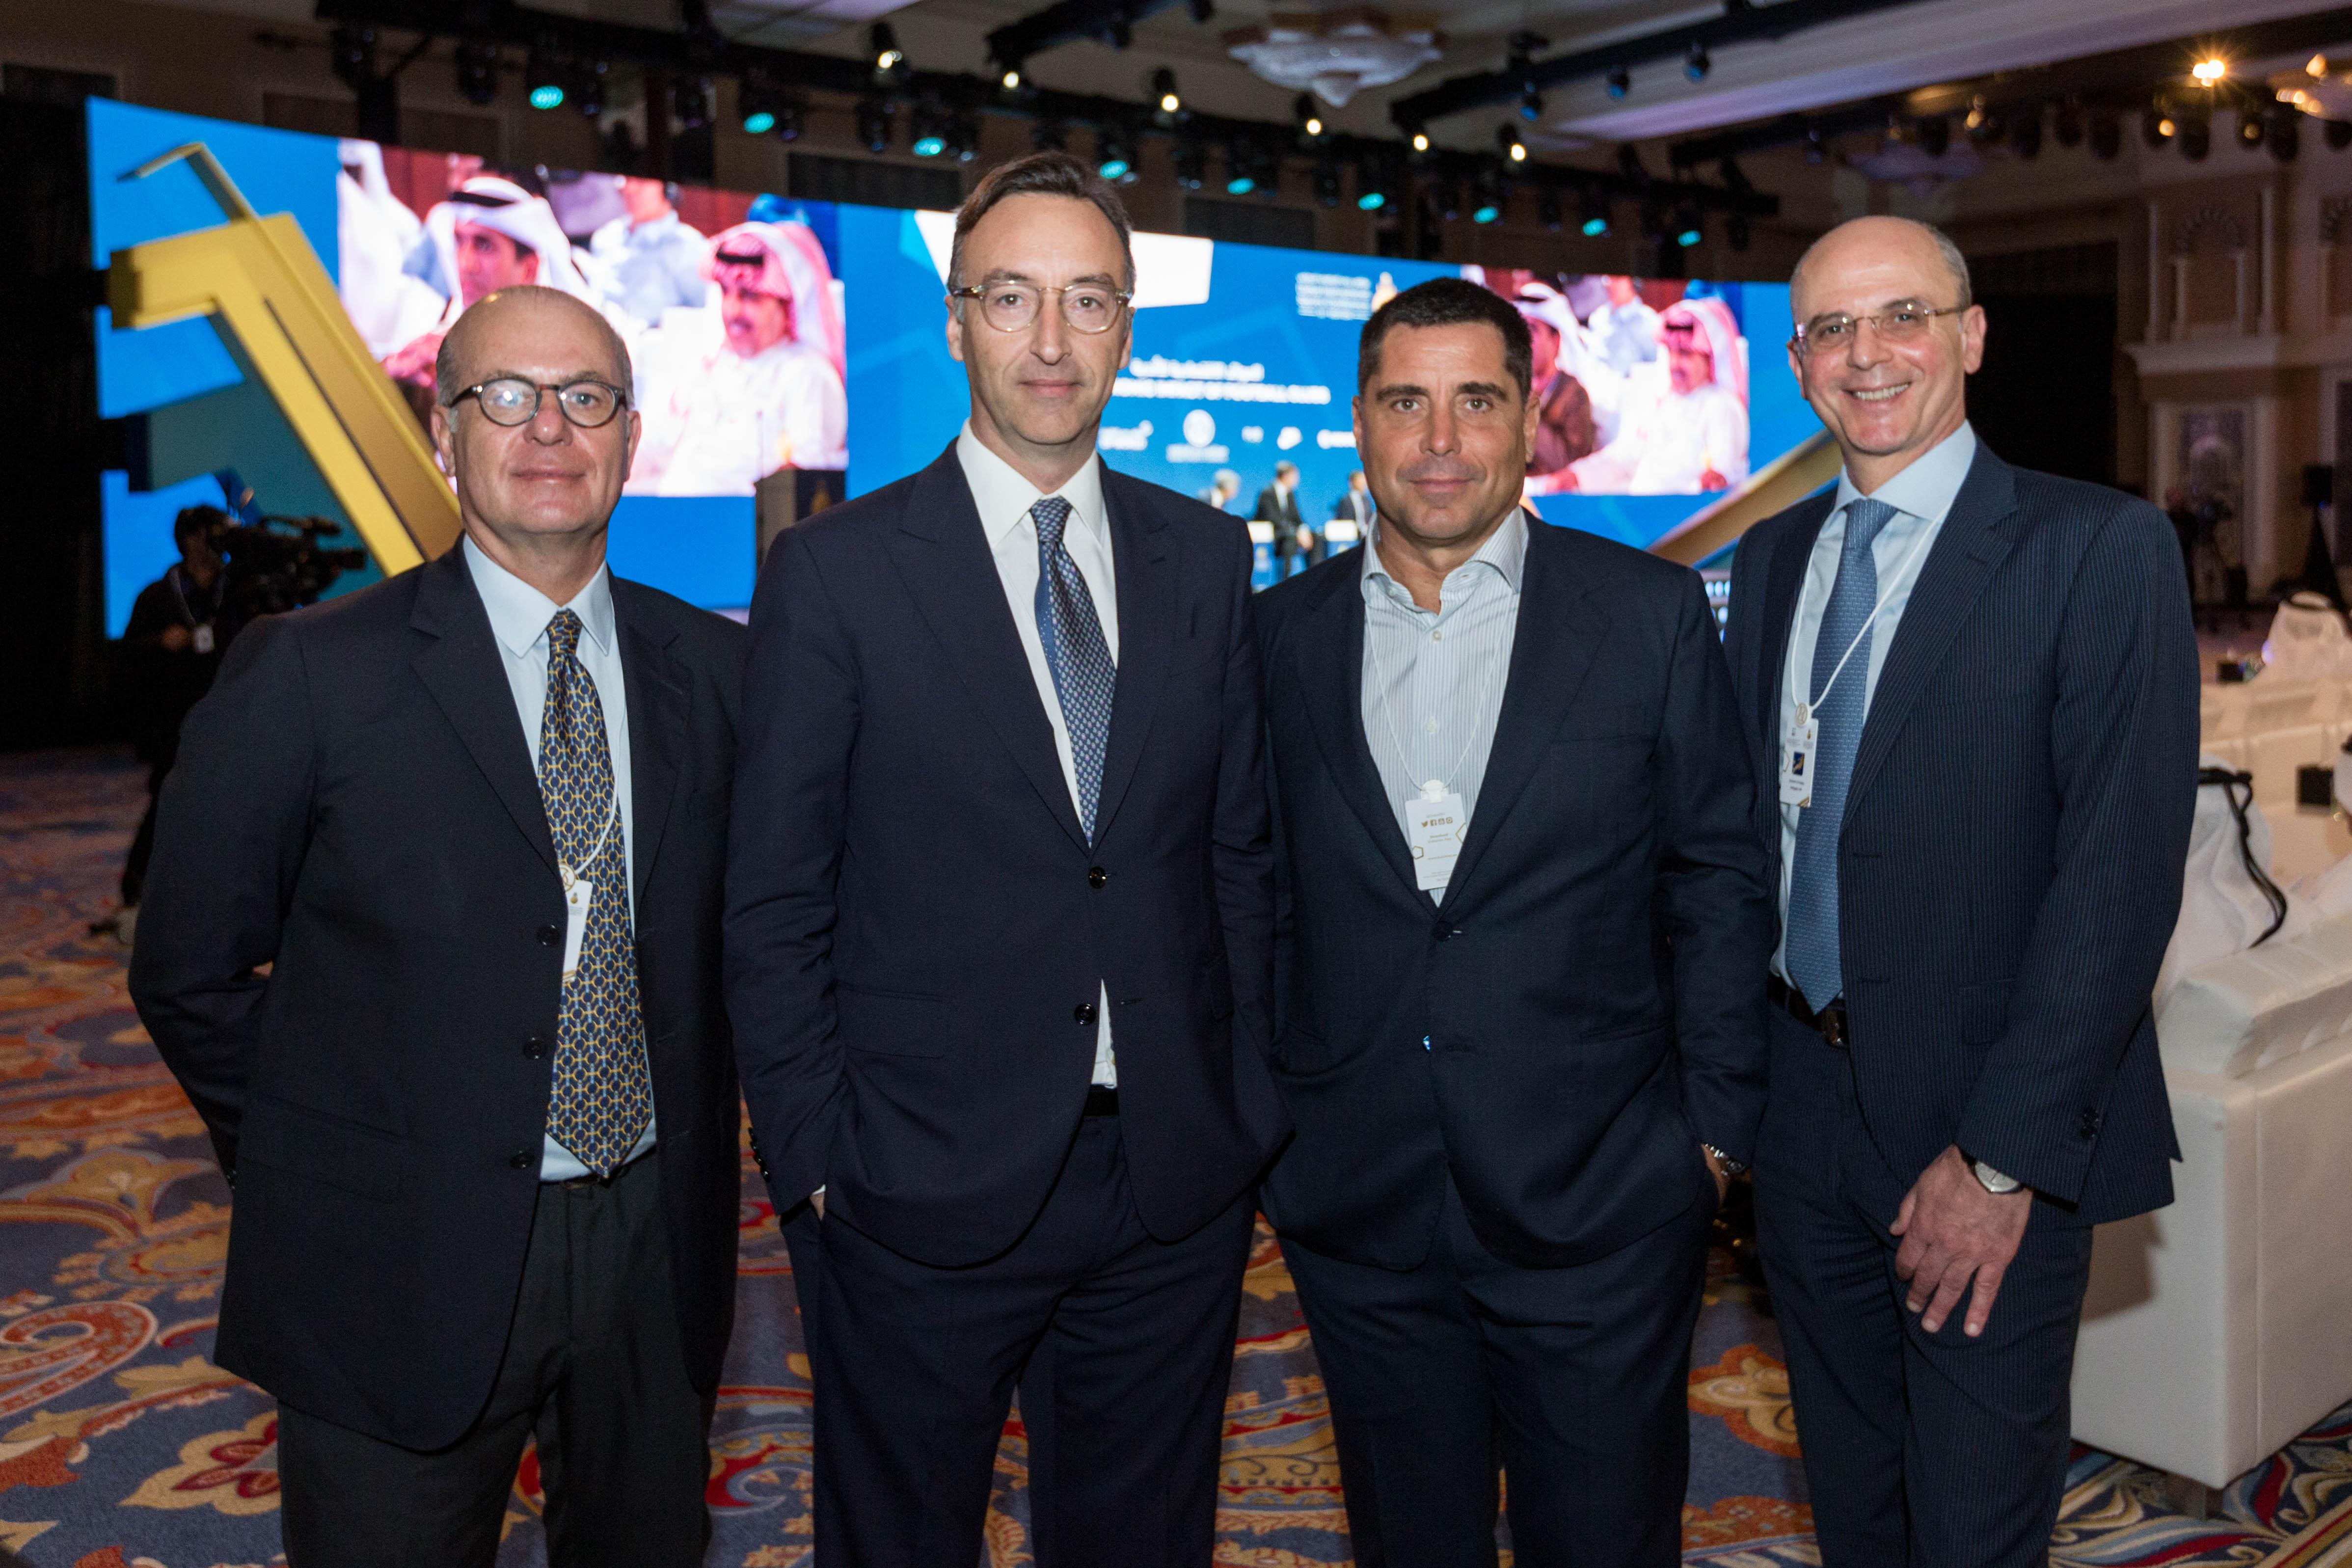 Umberto Gandini, CEO of Silva International Investments Marco Auletta, Riccardo Silva and Antonio D'addio at the Globe Soccer Awards 2019